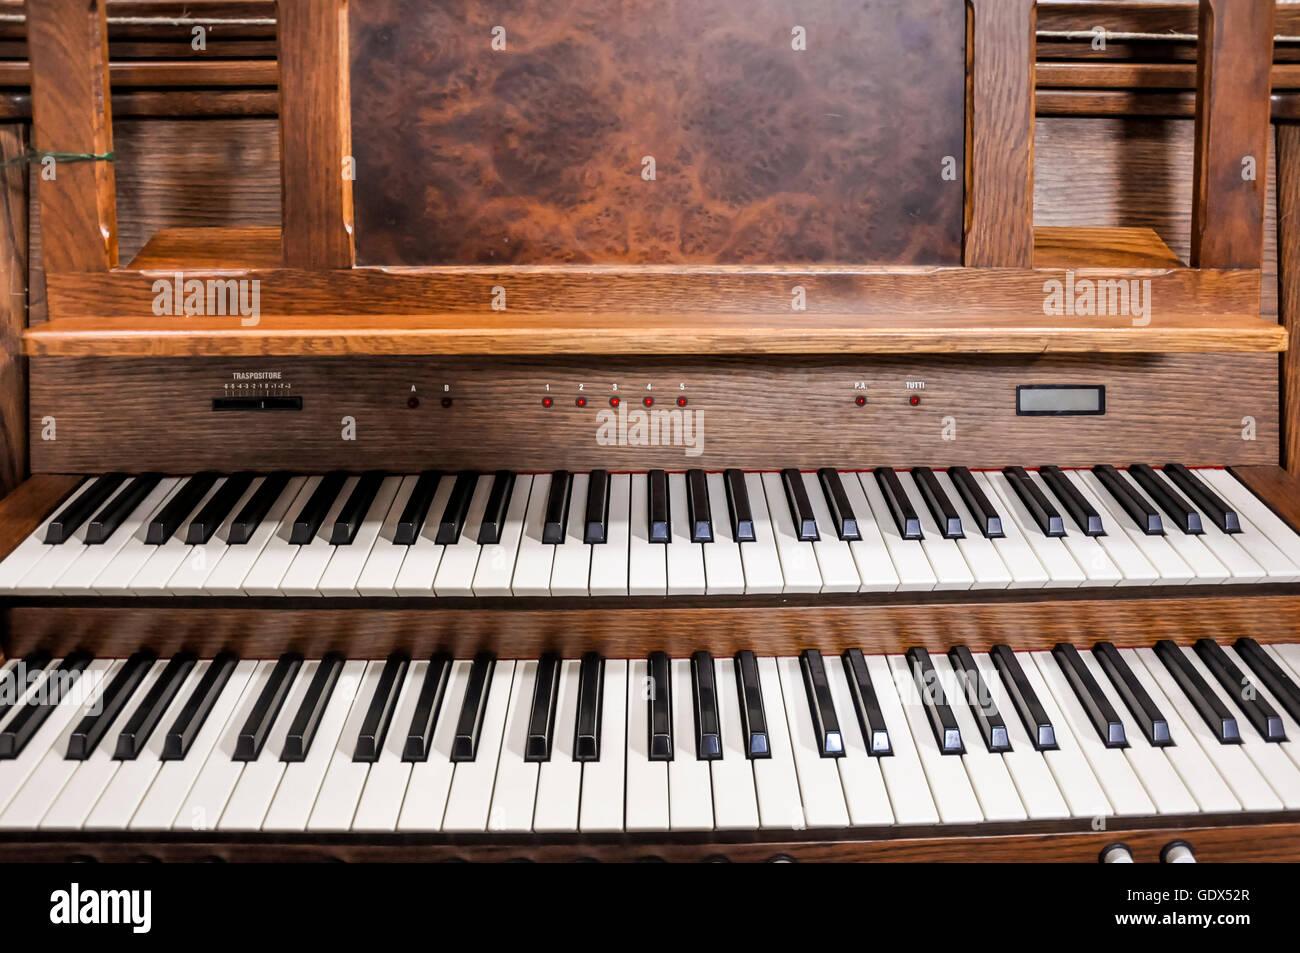 Church pipe organ. - Stock Image